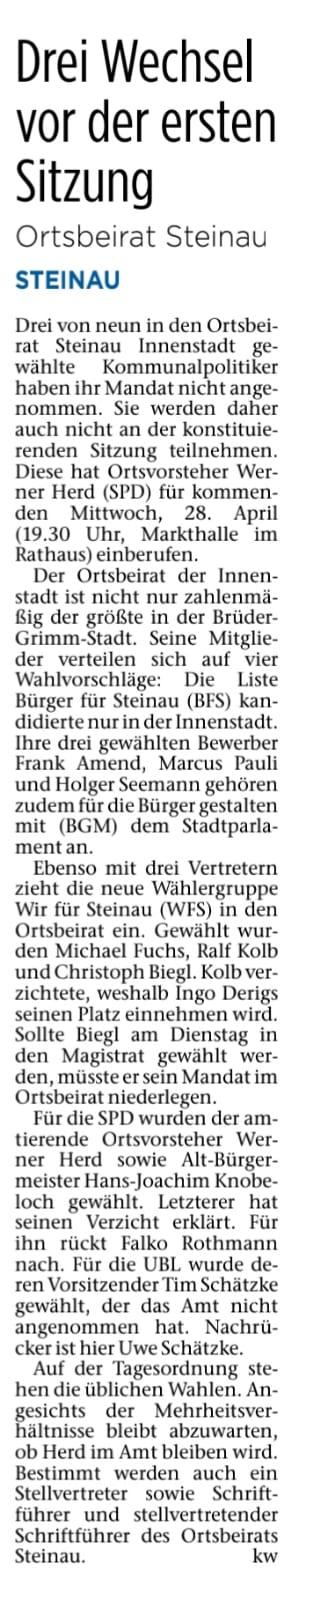 23.04.2021 - Bergwinkel Wochenbote